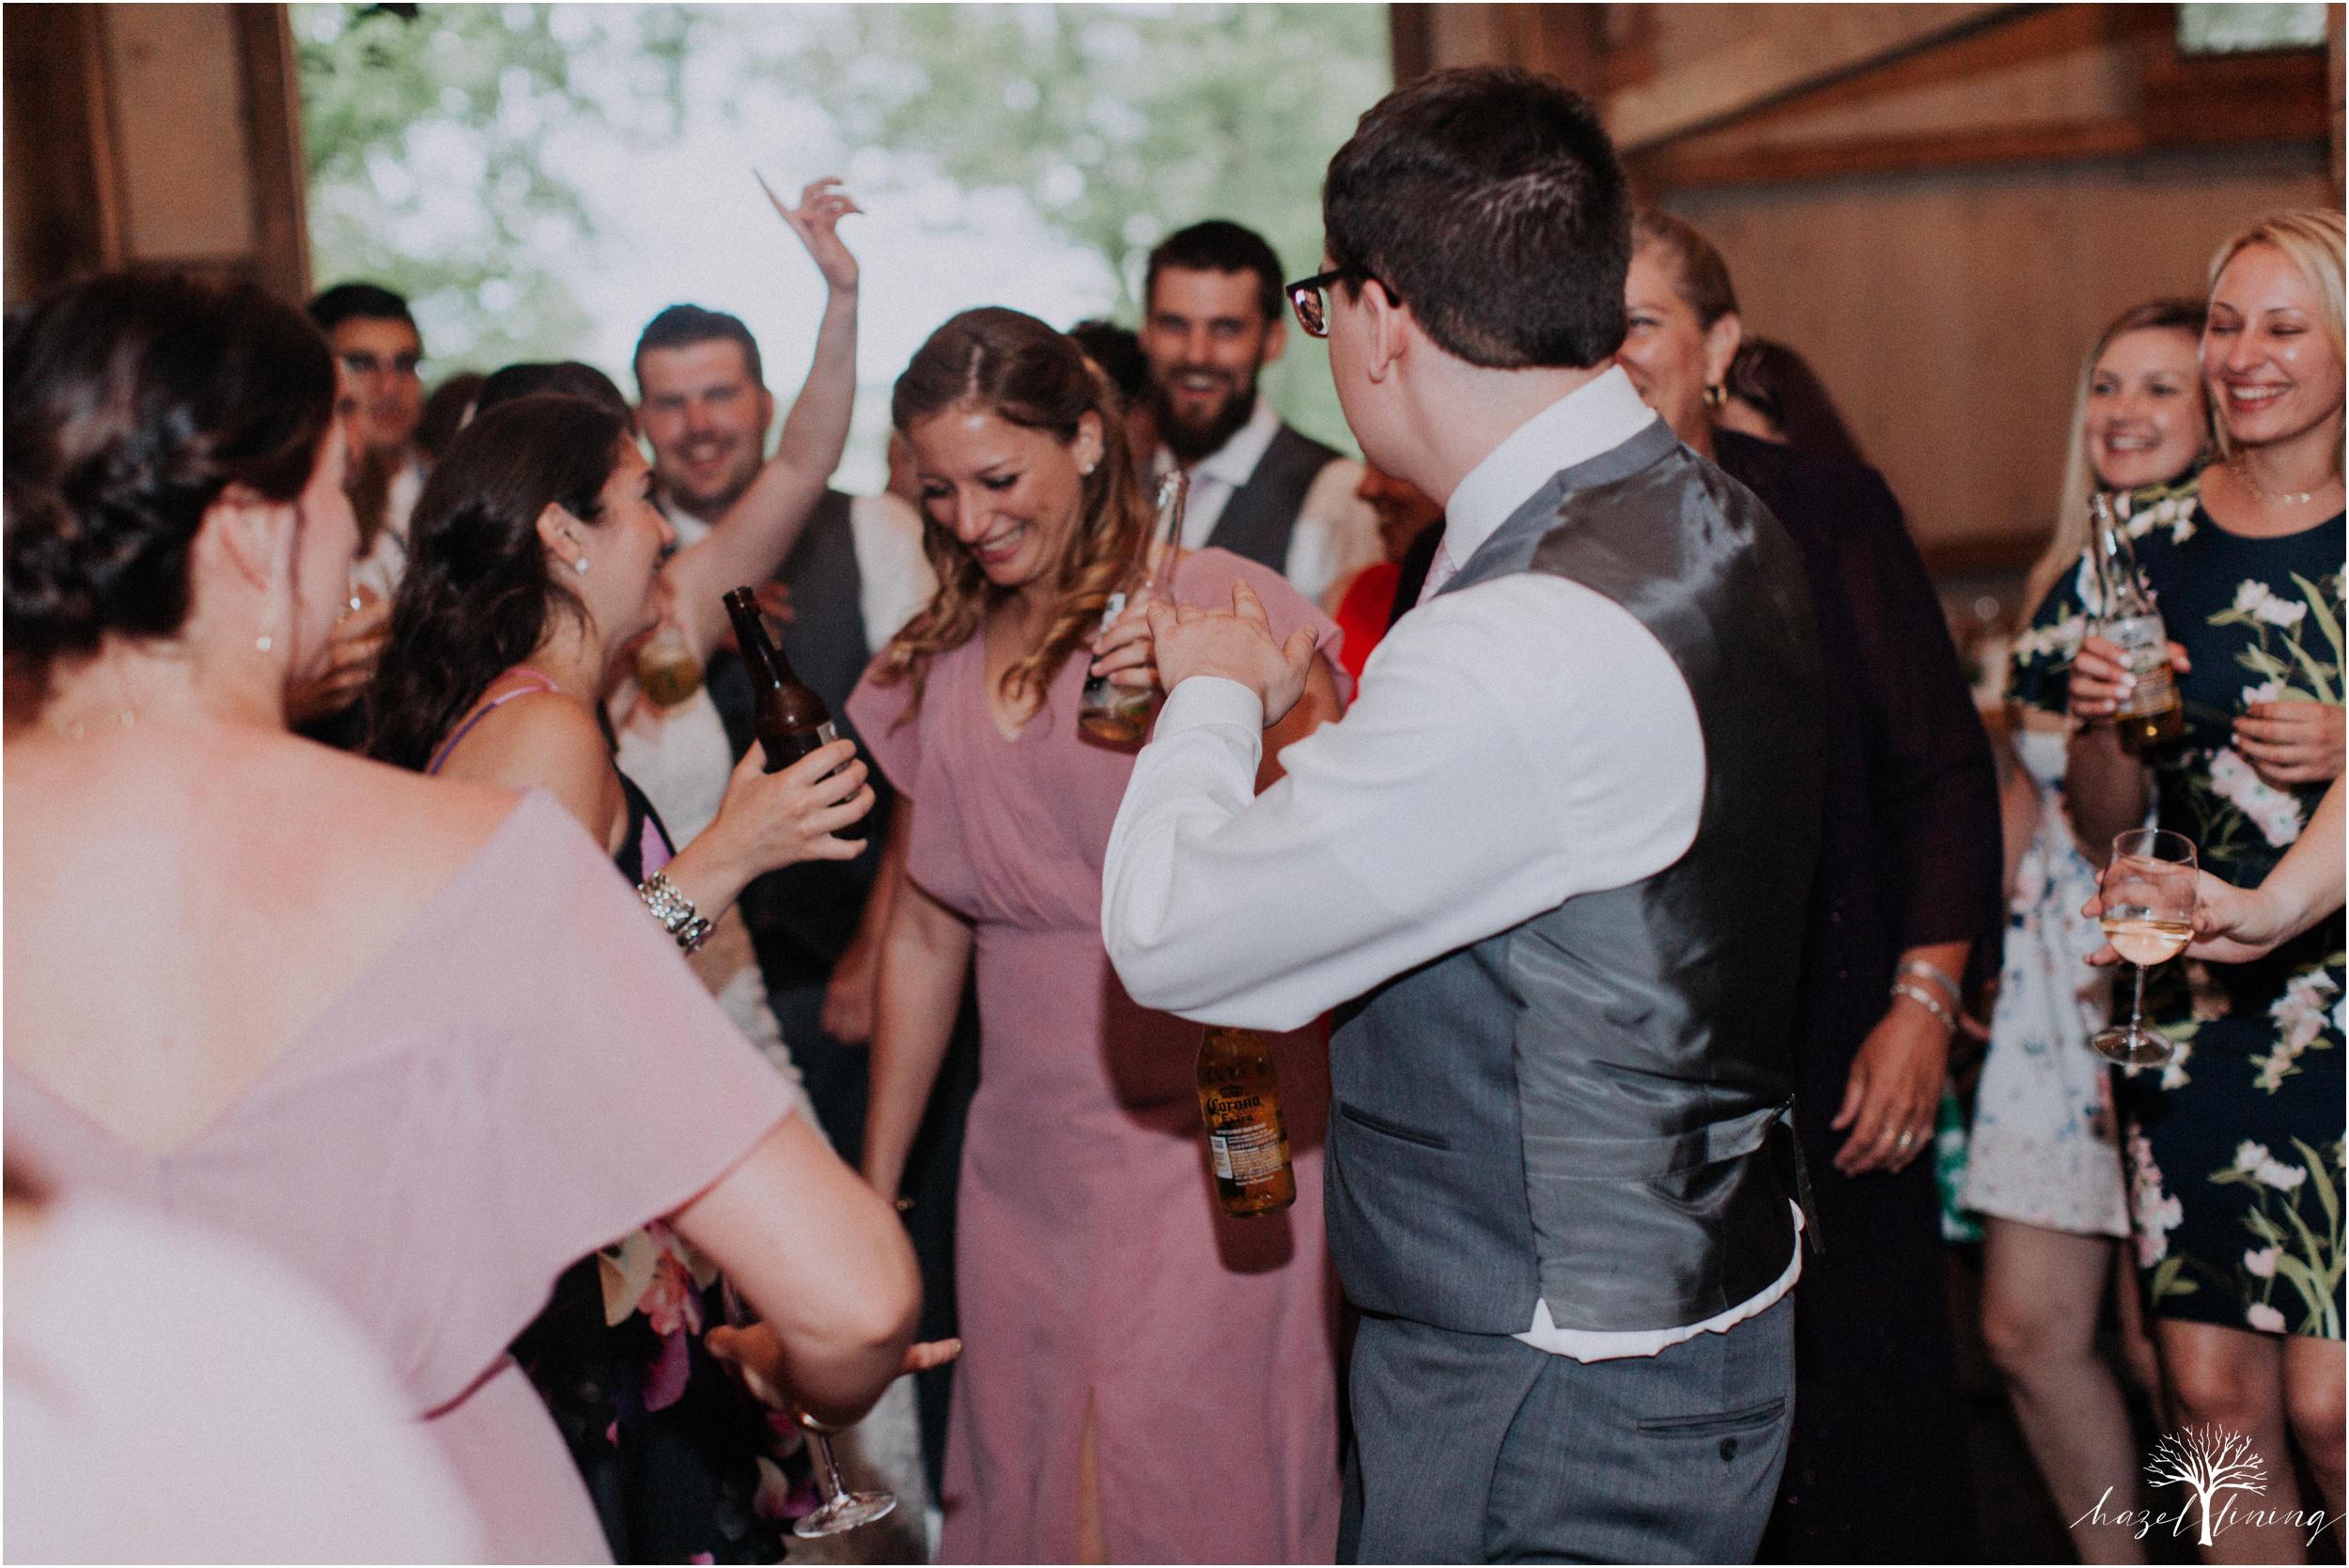 hazel-lining-travel-wedding-elopement-photography-lisa-landon-shoemaker-the-farm-bakery-and-events-bucks-county-quakertown-pennsylvania-summer-country-outdoor-farm-wedding_0151.jpg